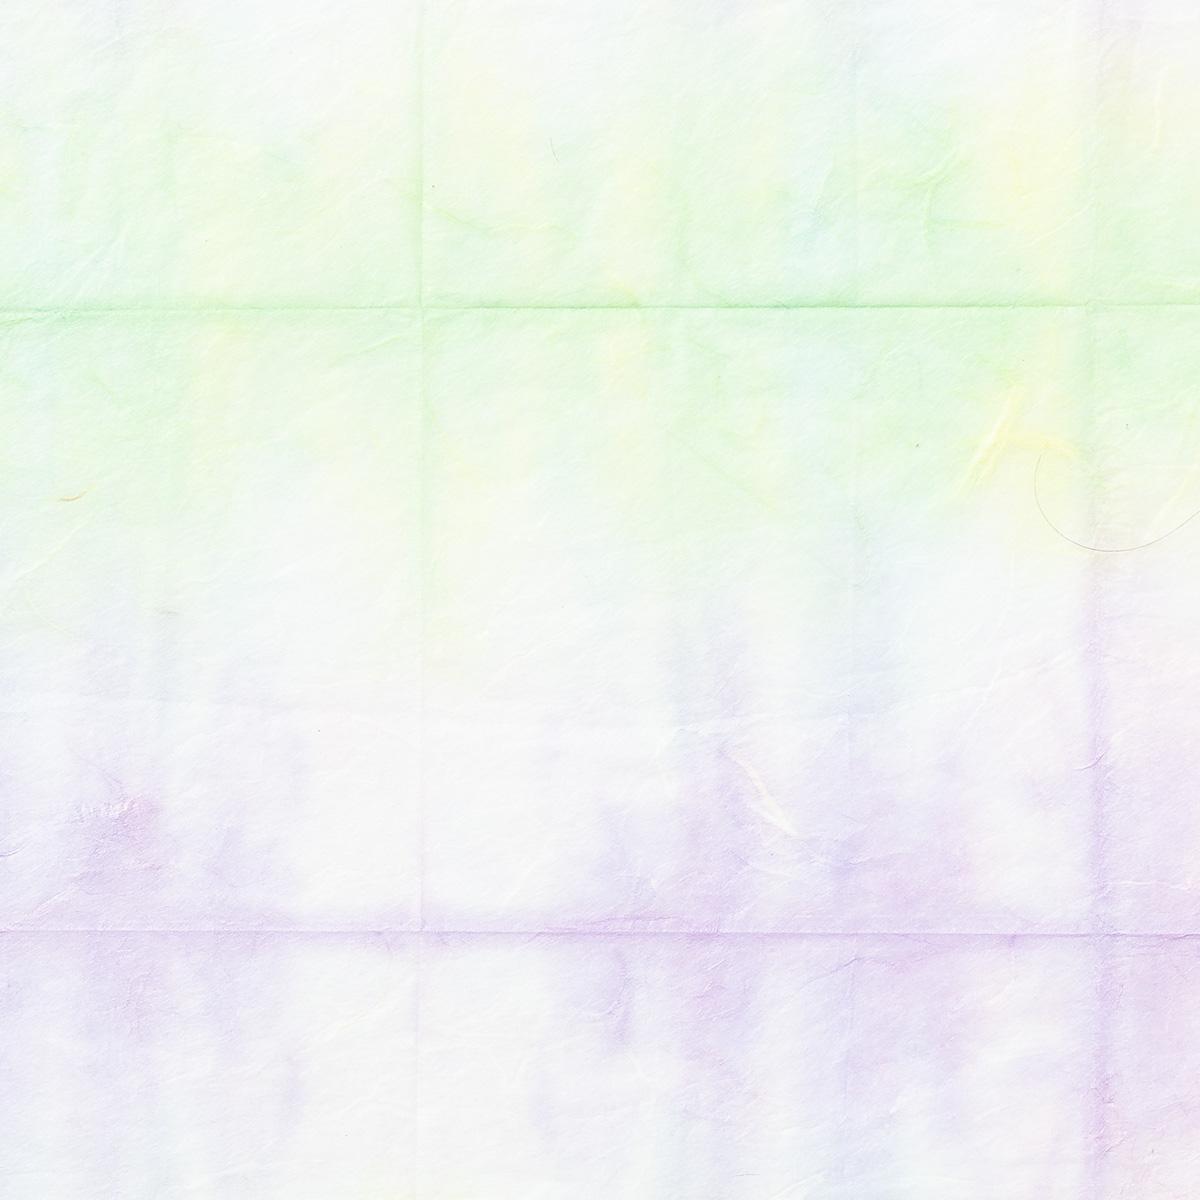 楮6匁 雲竜紙 板締め No.21